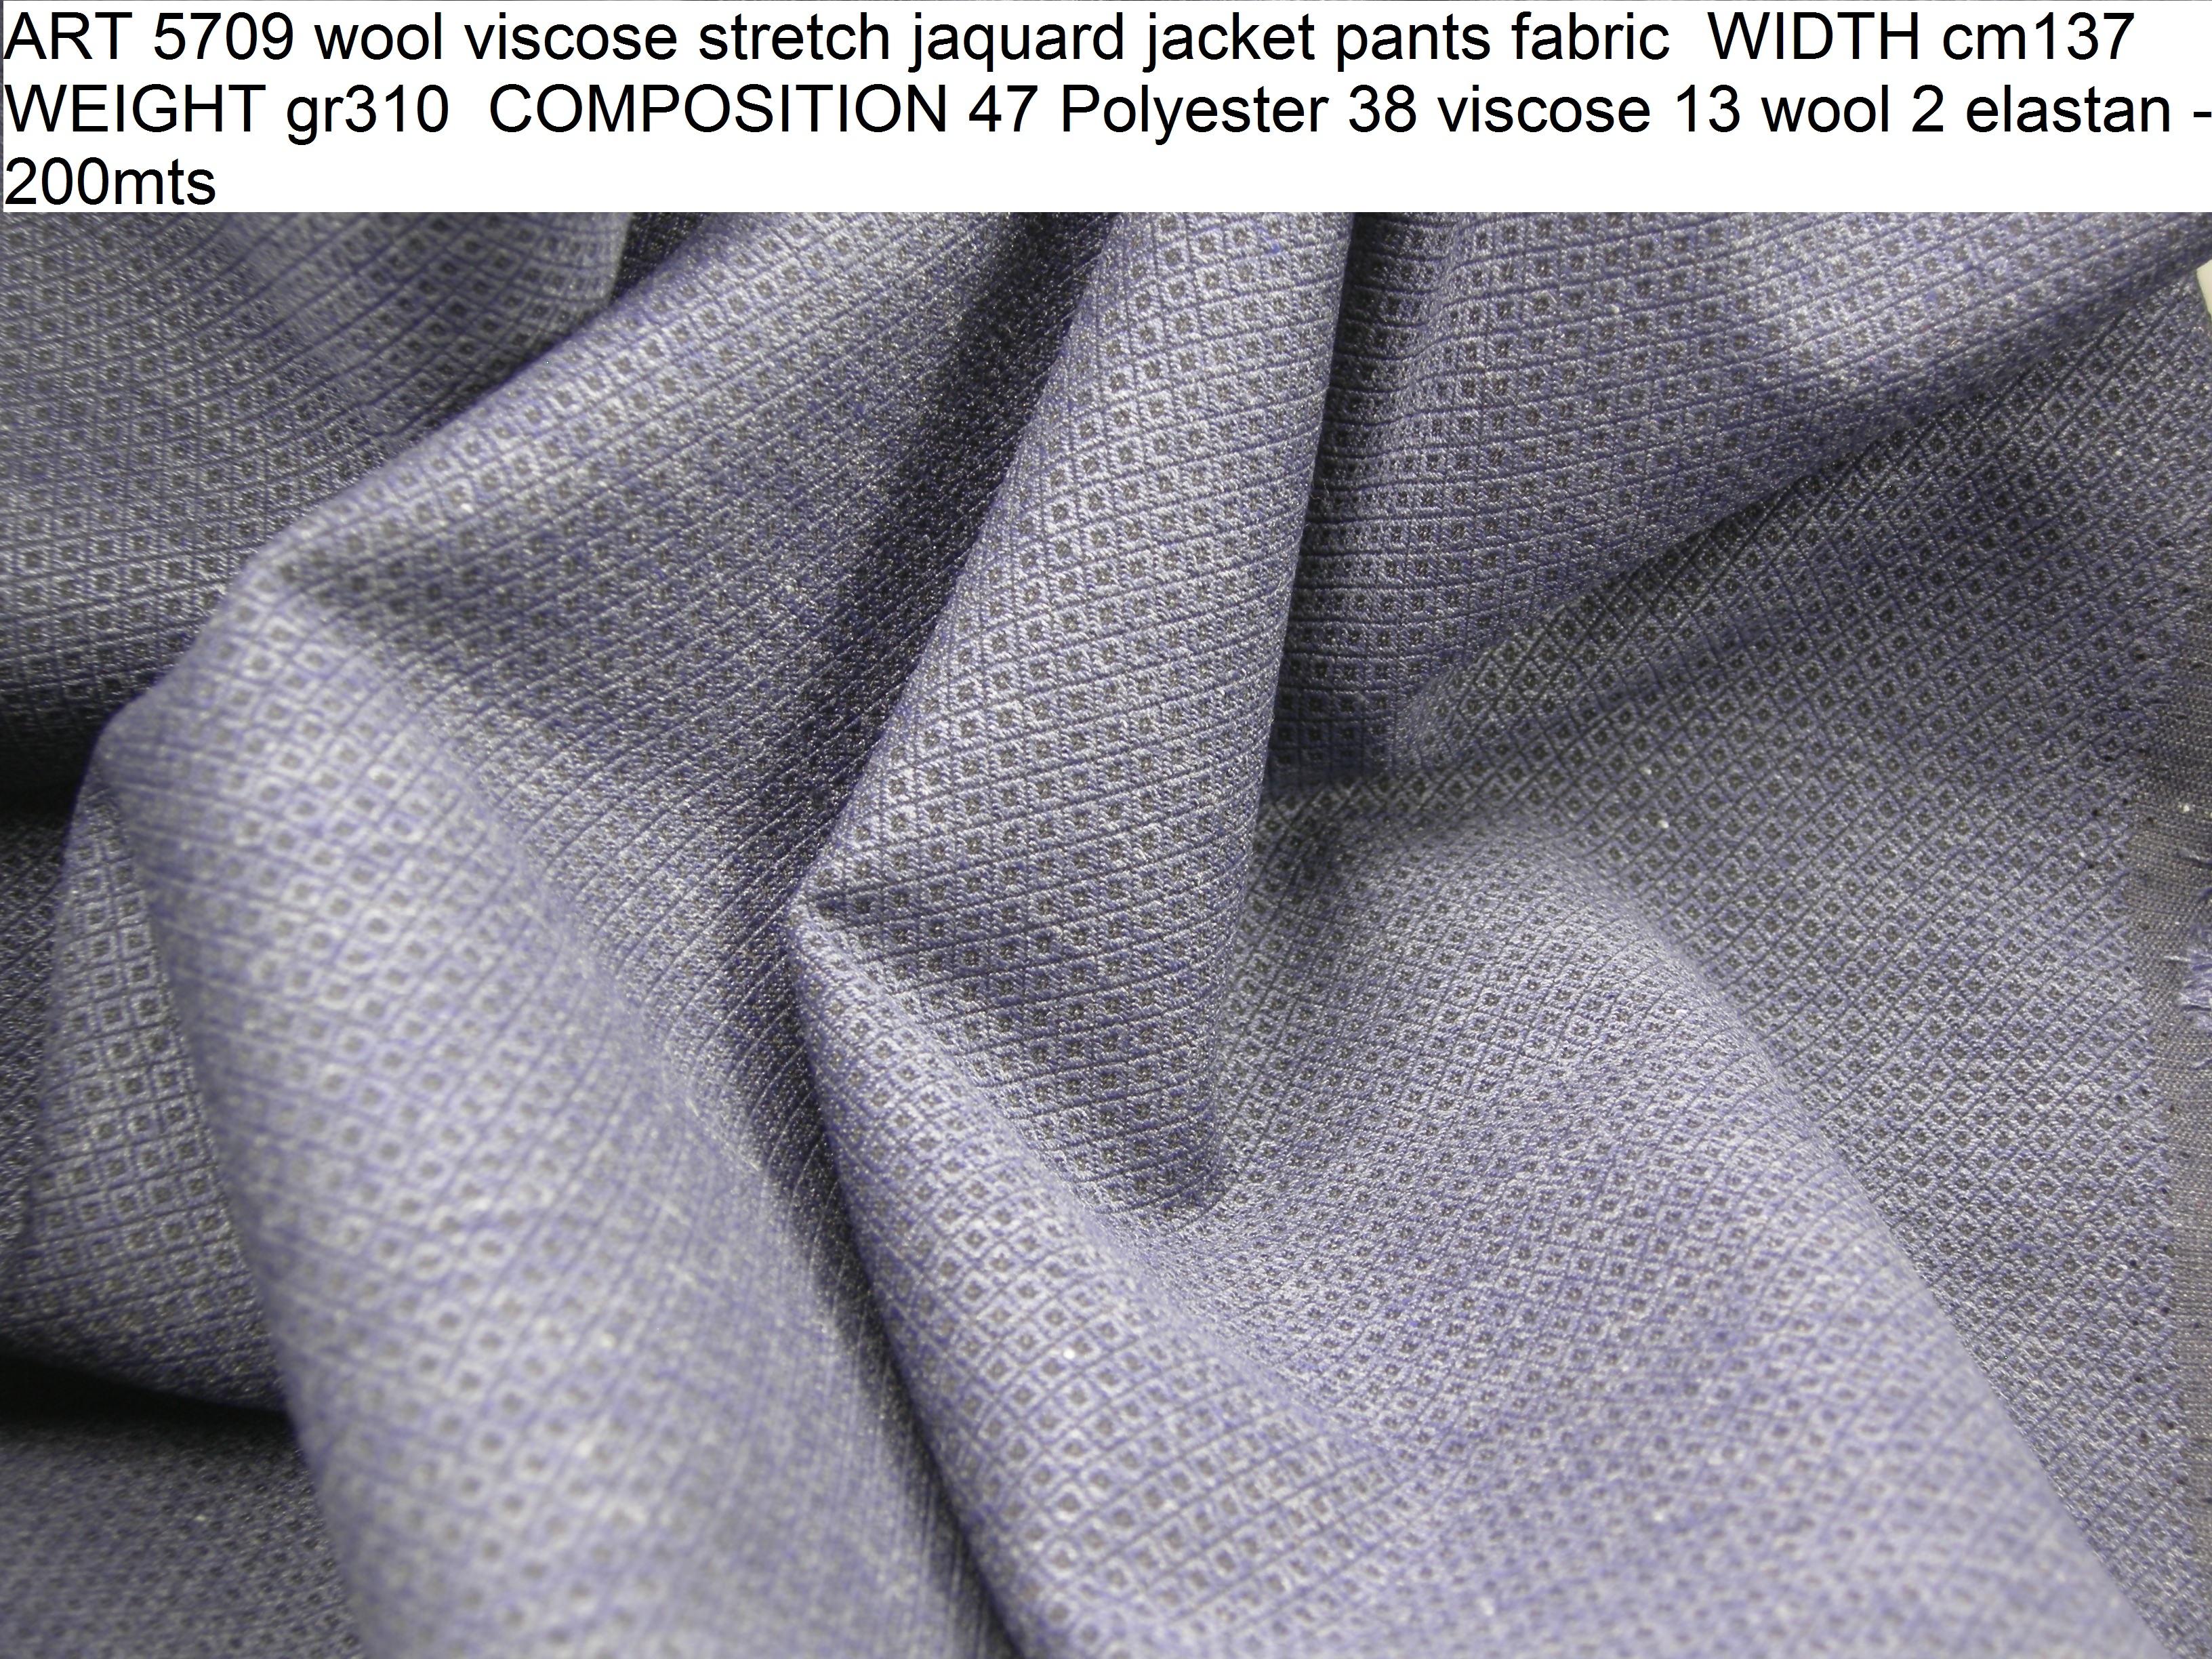 ART 5709 wool viscose stretch jaquard jacket pants fabric WIDTH cm137 WEIGHT gr310 COMPOSITION 47 Polyester 38 viscose 13 wool 2 elastan - 200mts